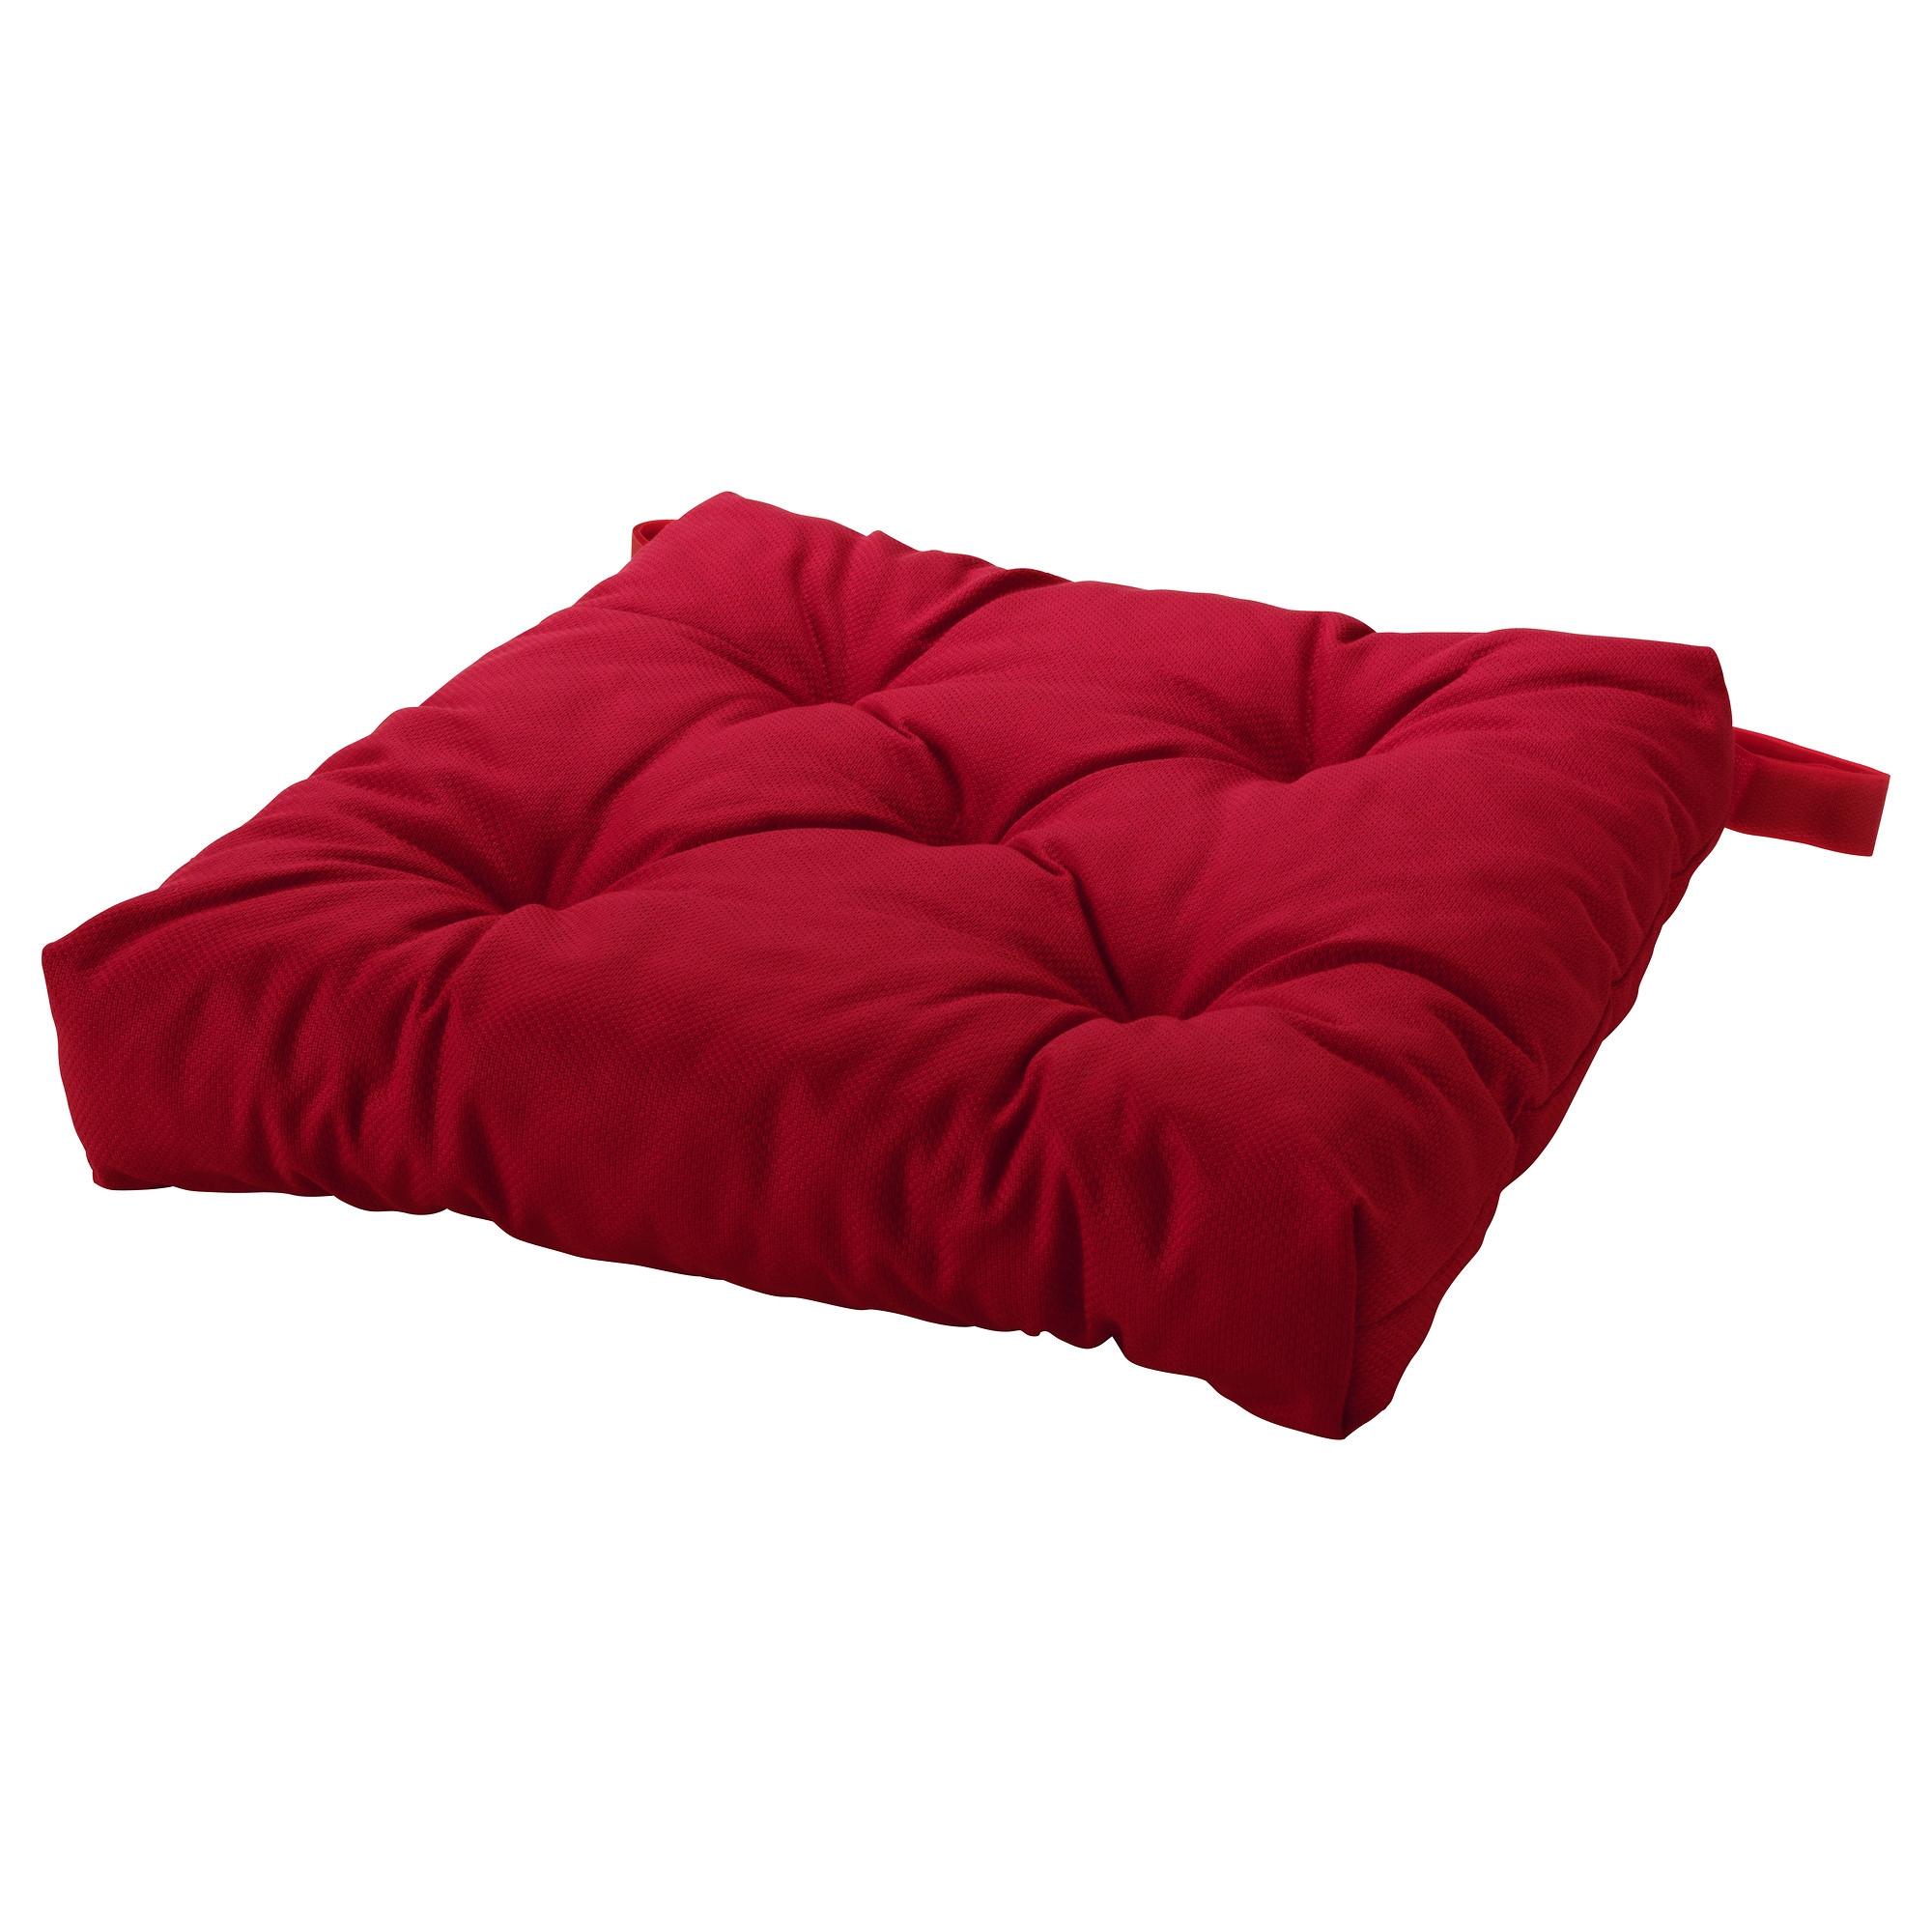 Malinda coj n para silla rojo - Cojines exterior ikea ...